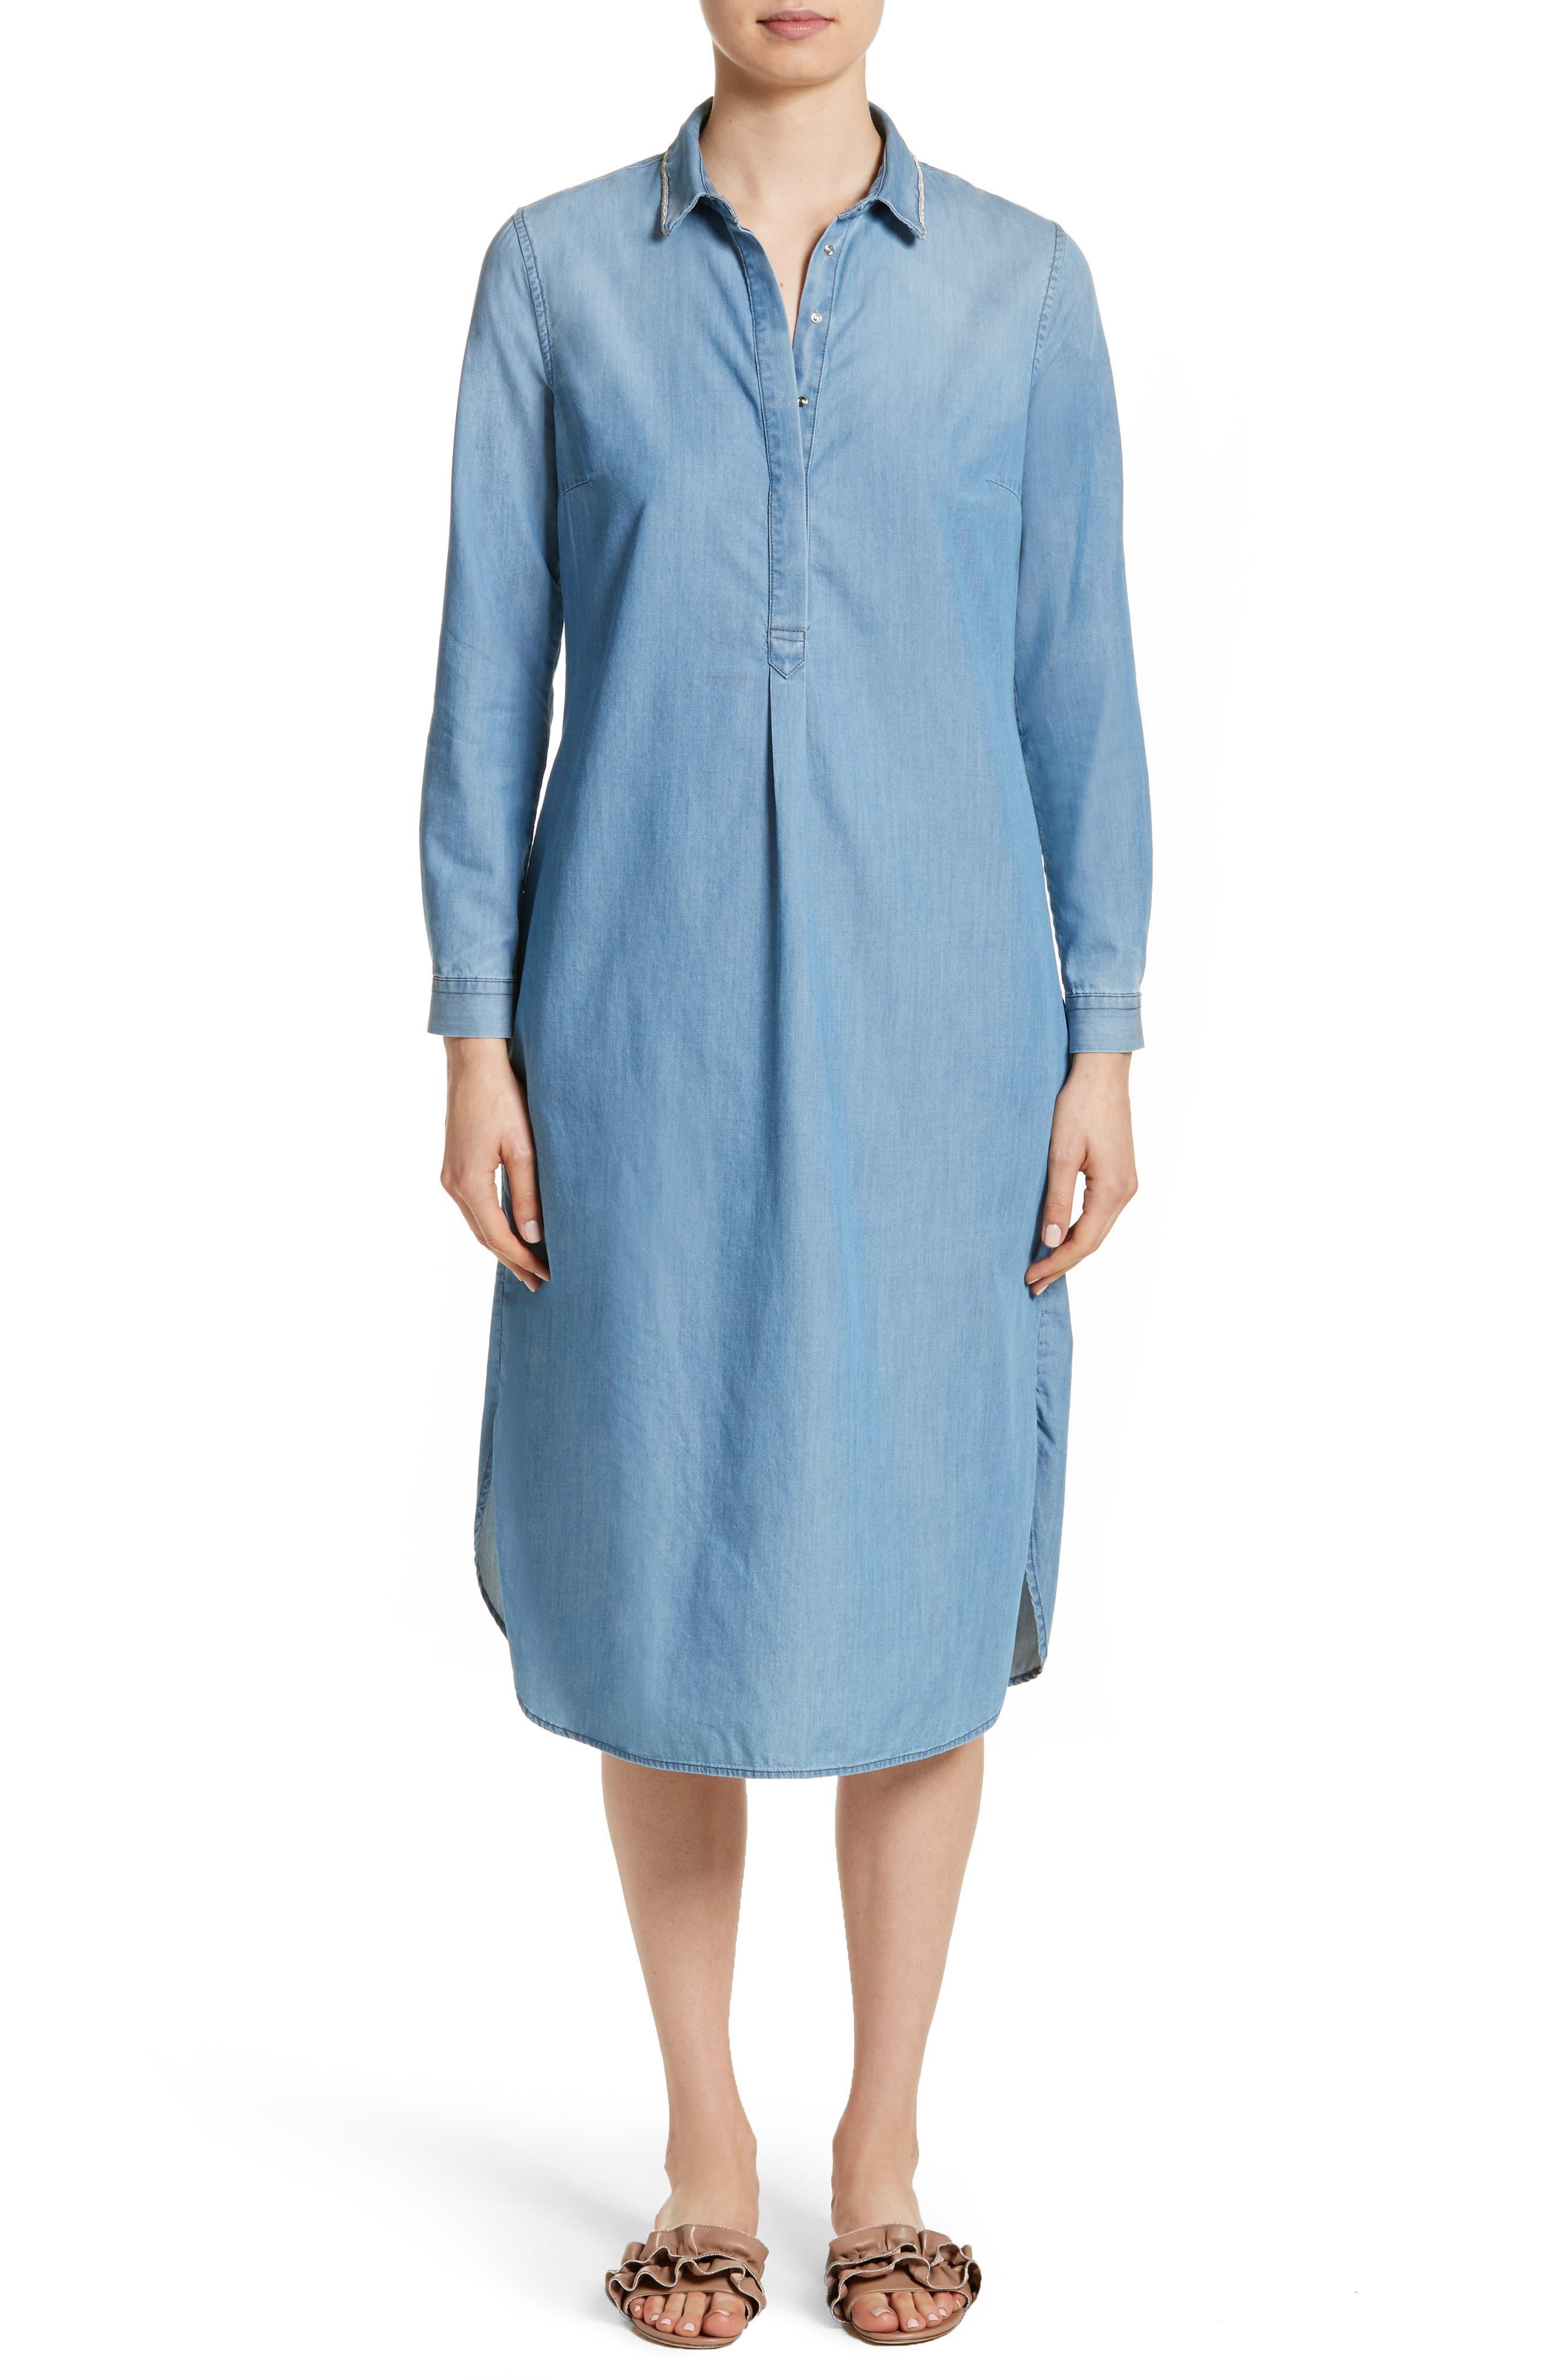 Cotton & Cashmere Chambray Shirtdress,                             Main thumbnail 1, color,                             400